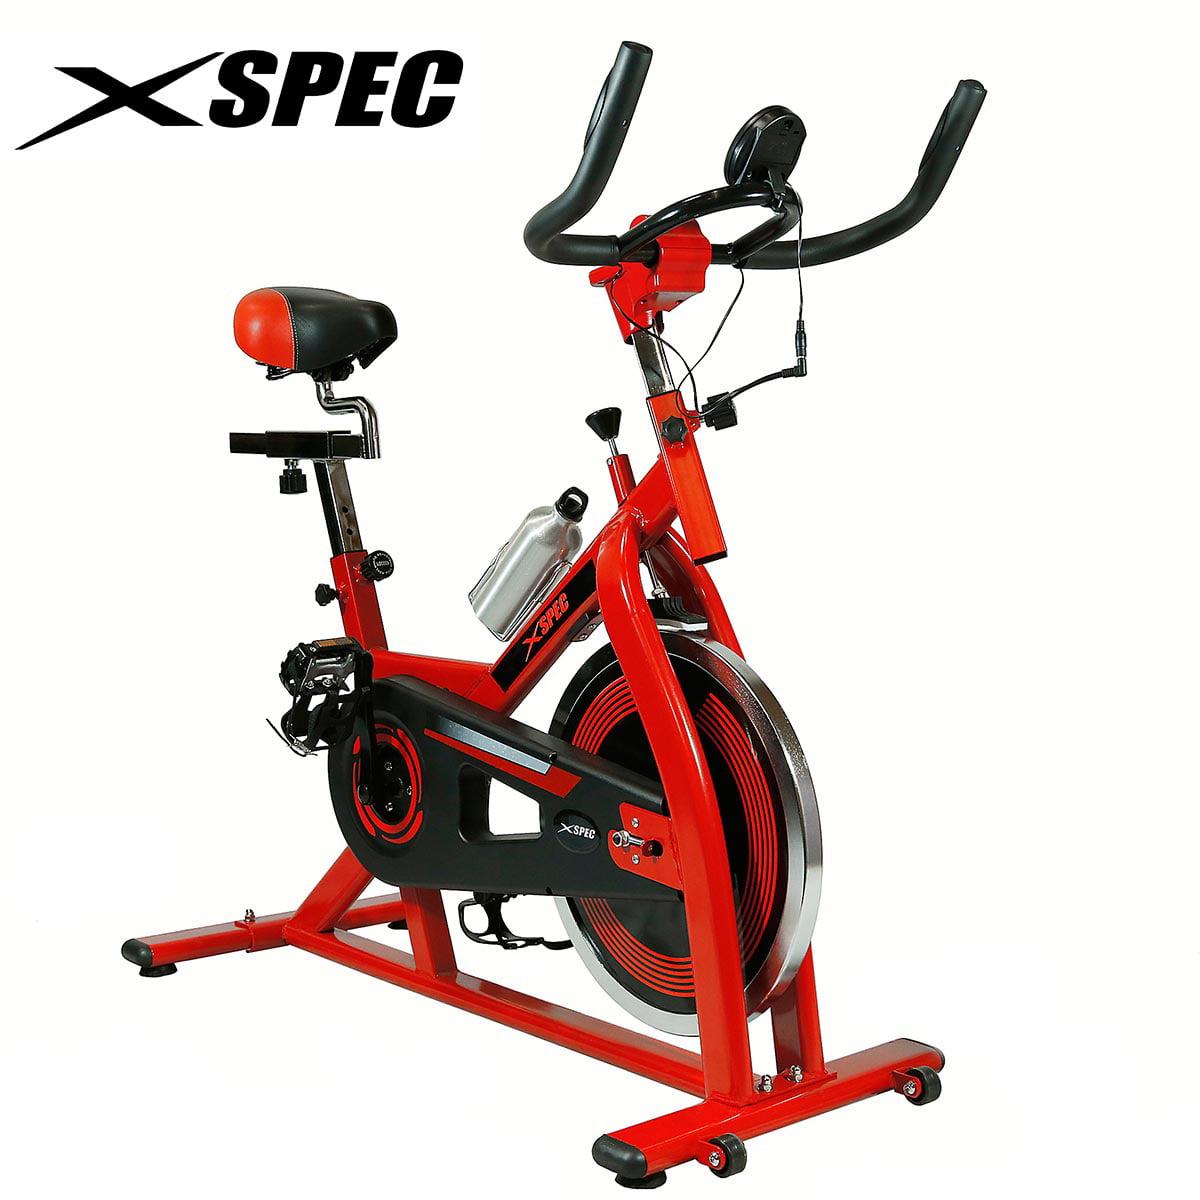 Xspec Pro Stationary Upright Exercise Bike Indoor Cycling...